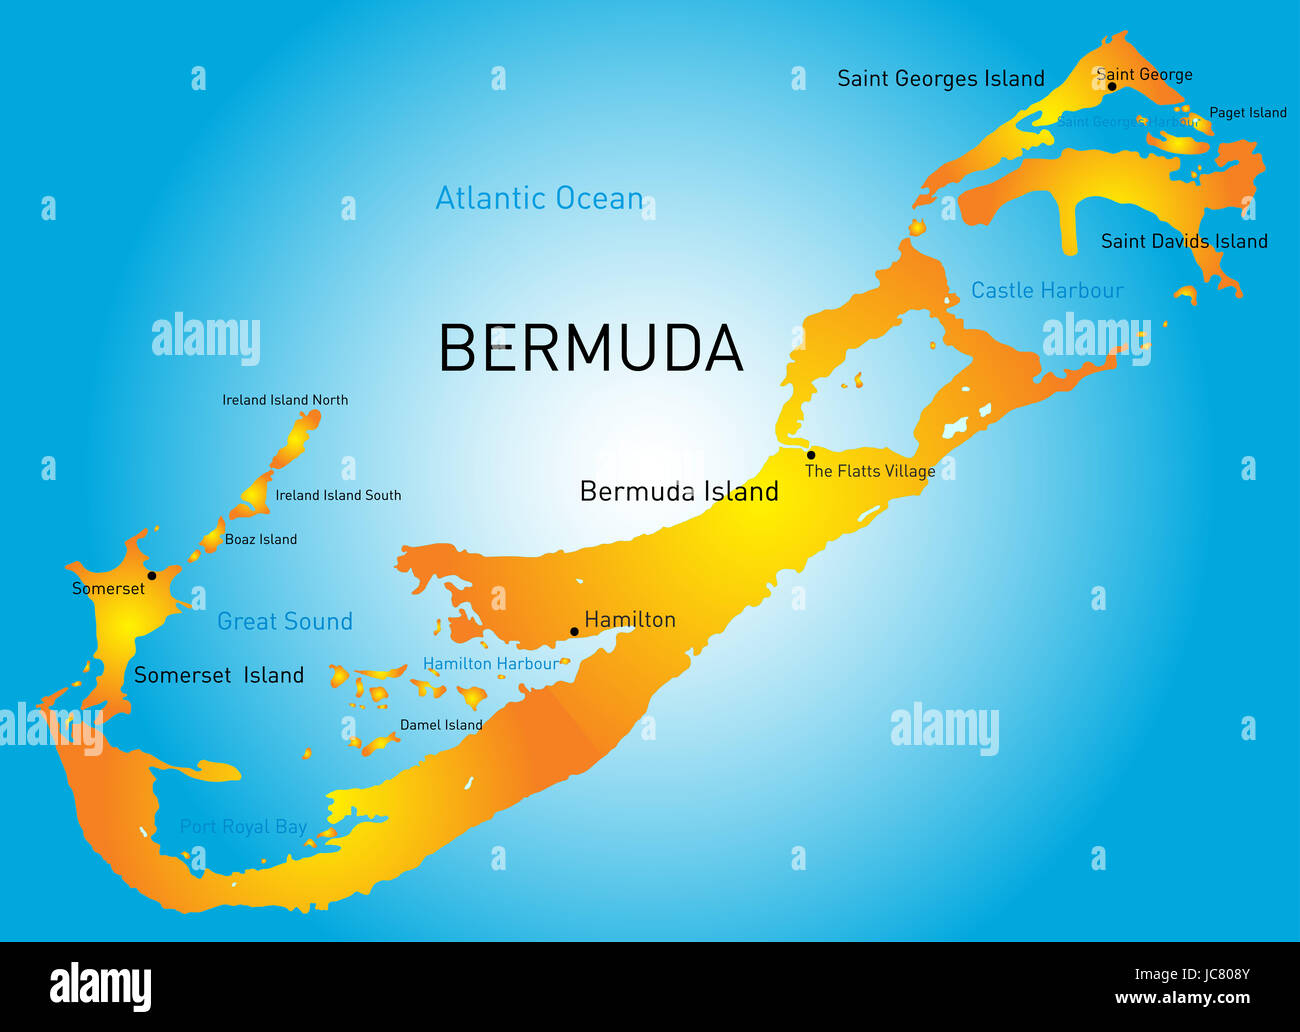 Vector map of Bermuda region Stock Photo 145234683 Alamy